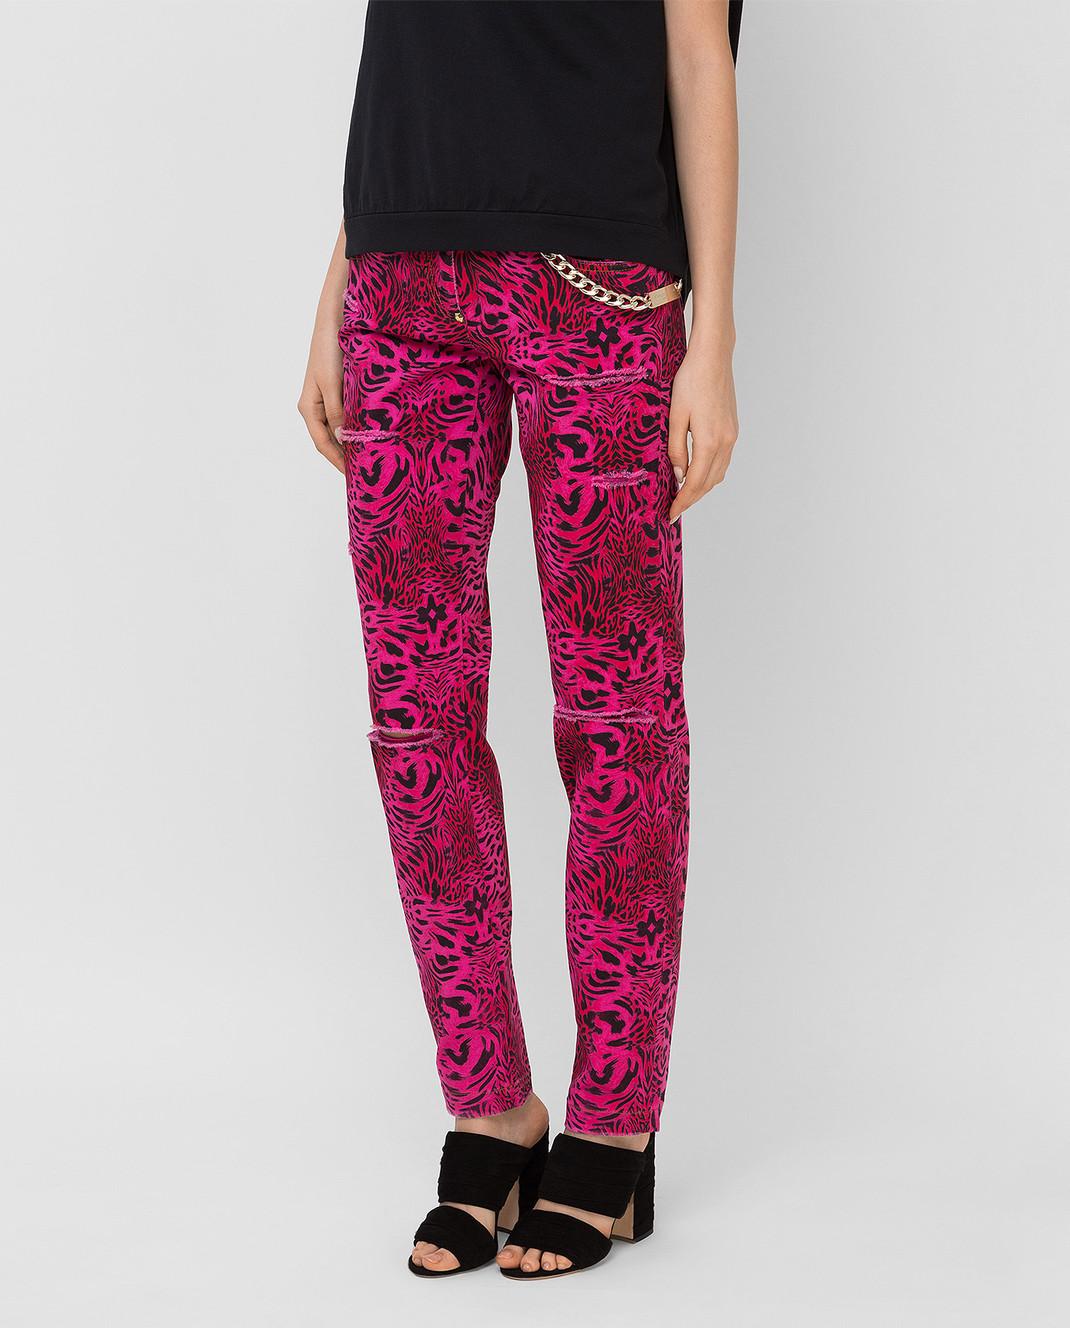 Philipp Plein Розовые джинсы CWDT0208 изображение 3